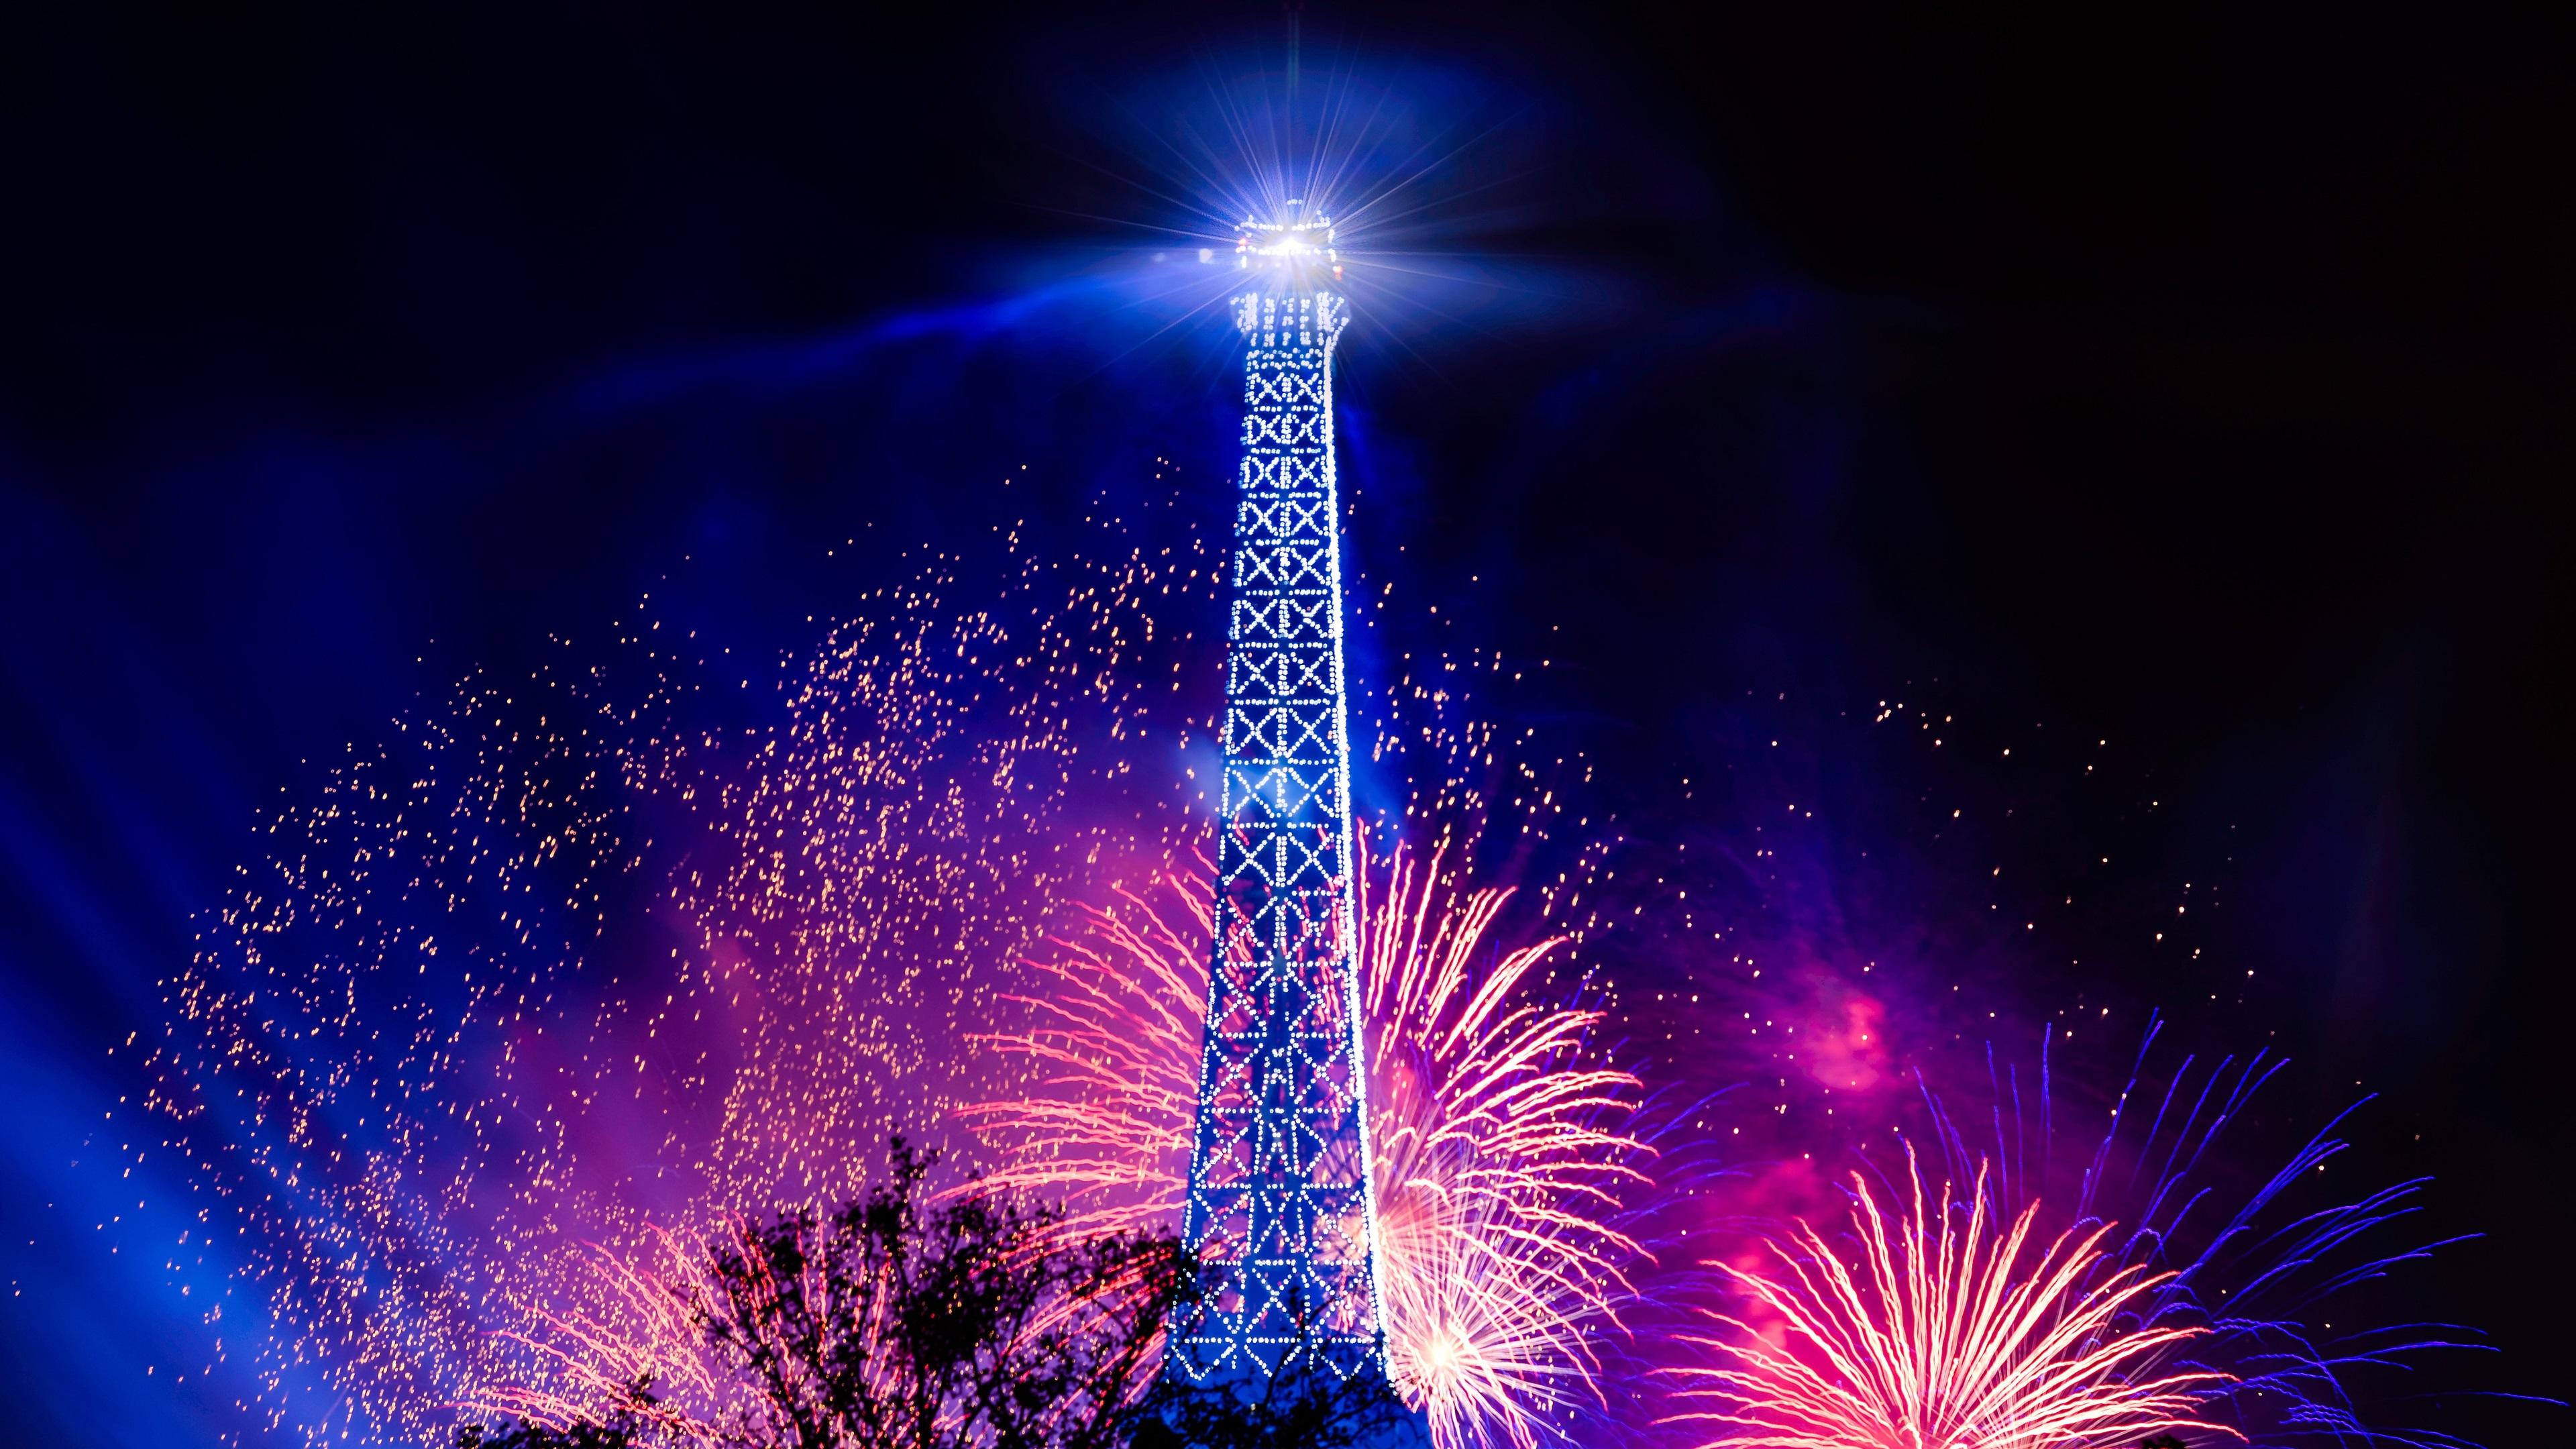 Fondos De Pantalla Torre Eiffel, Noche De Fiesta, Luces